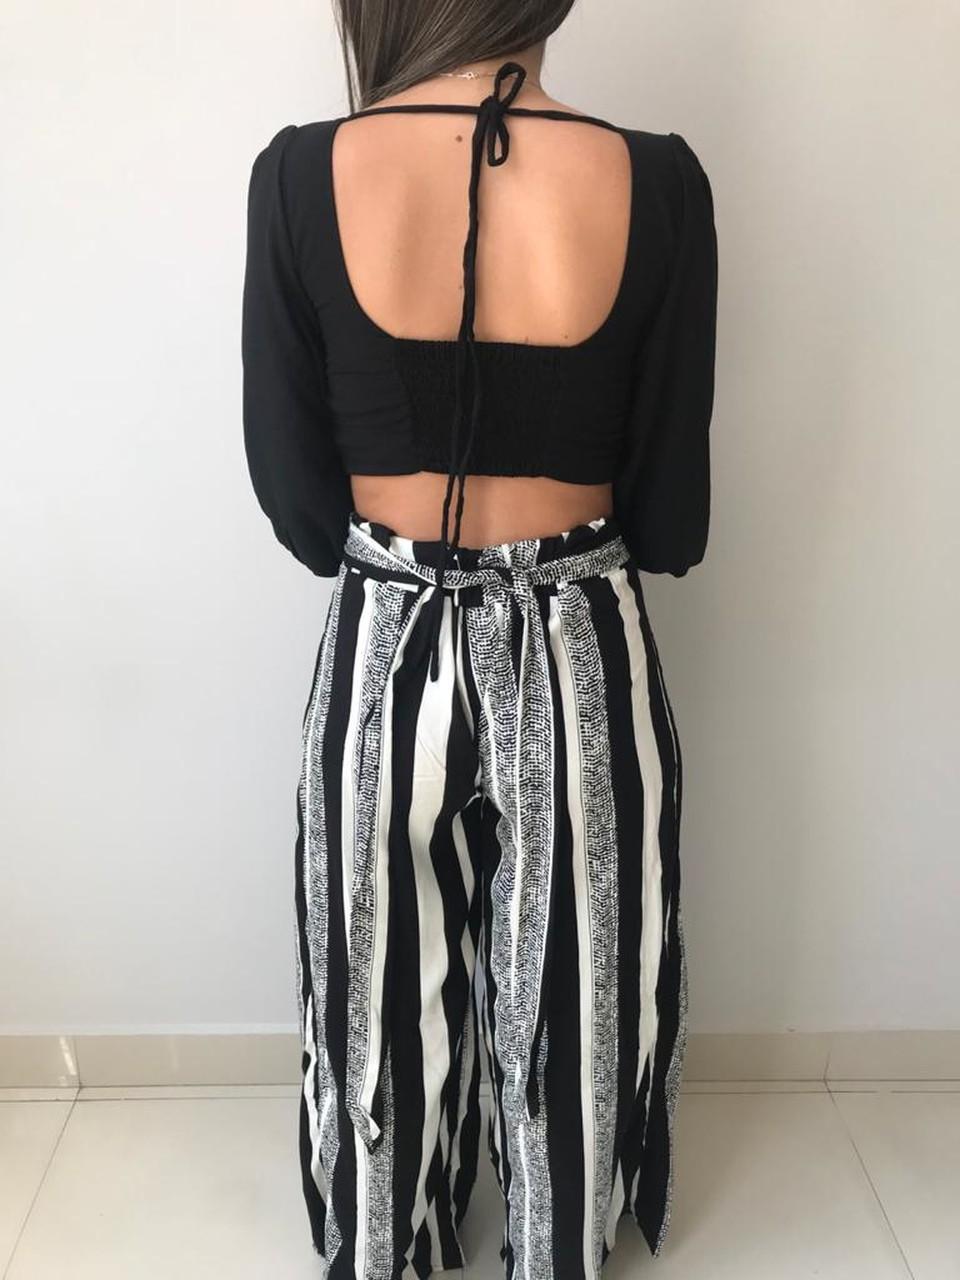 Pantalona Listrada